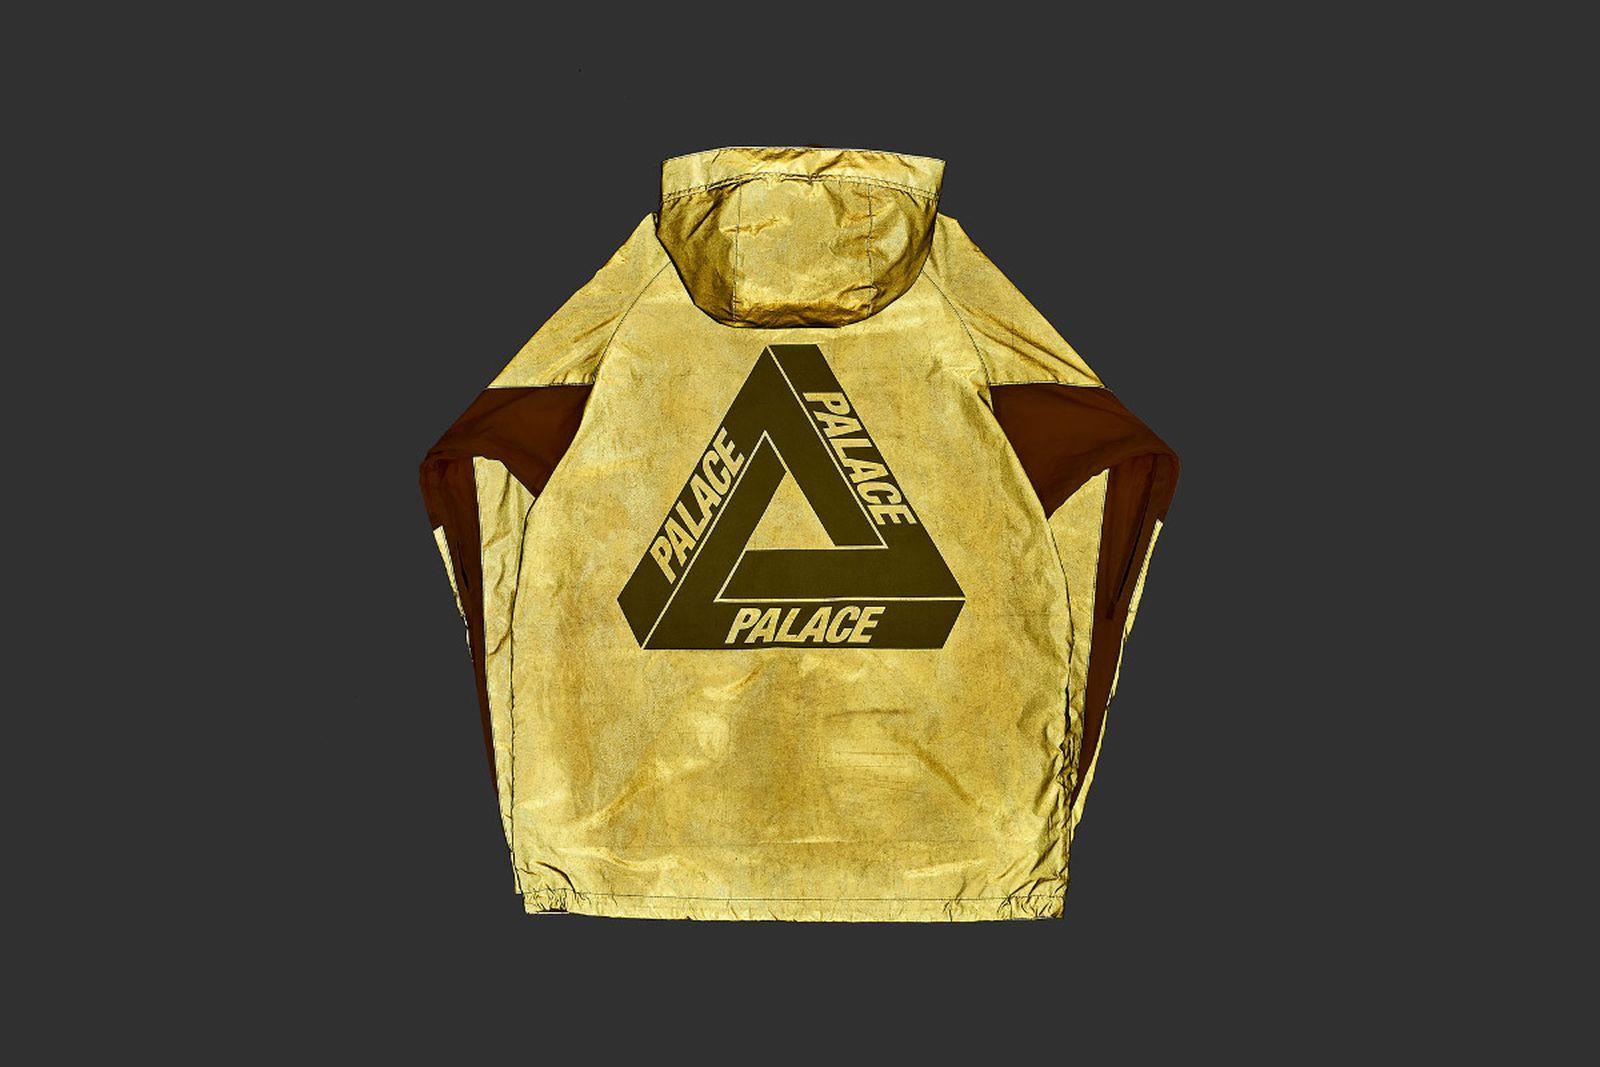 Palace 2019 Autumn Jacket Deflector yellow reflective back fw19